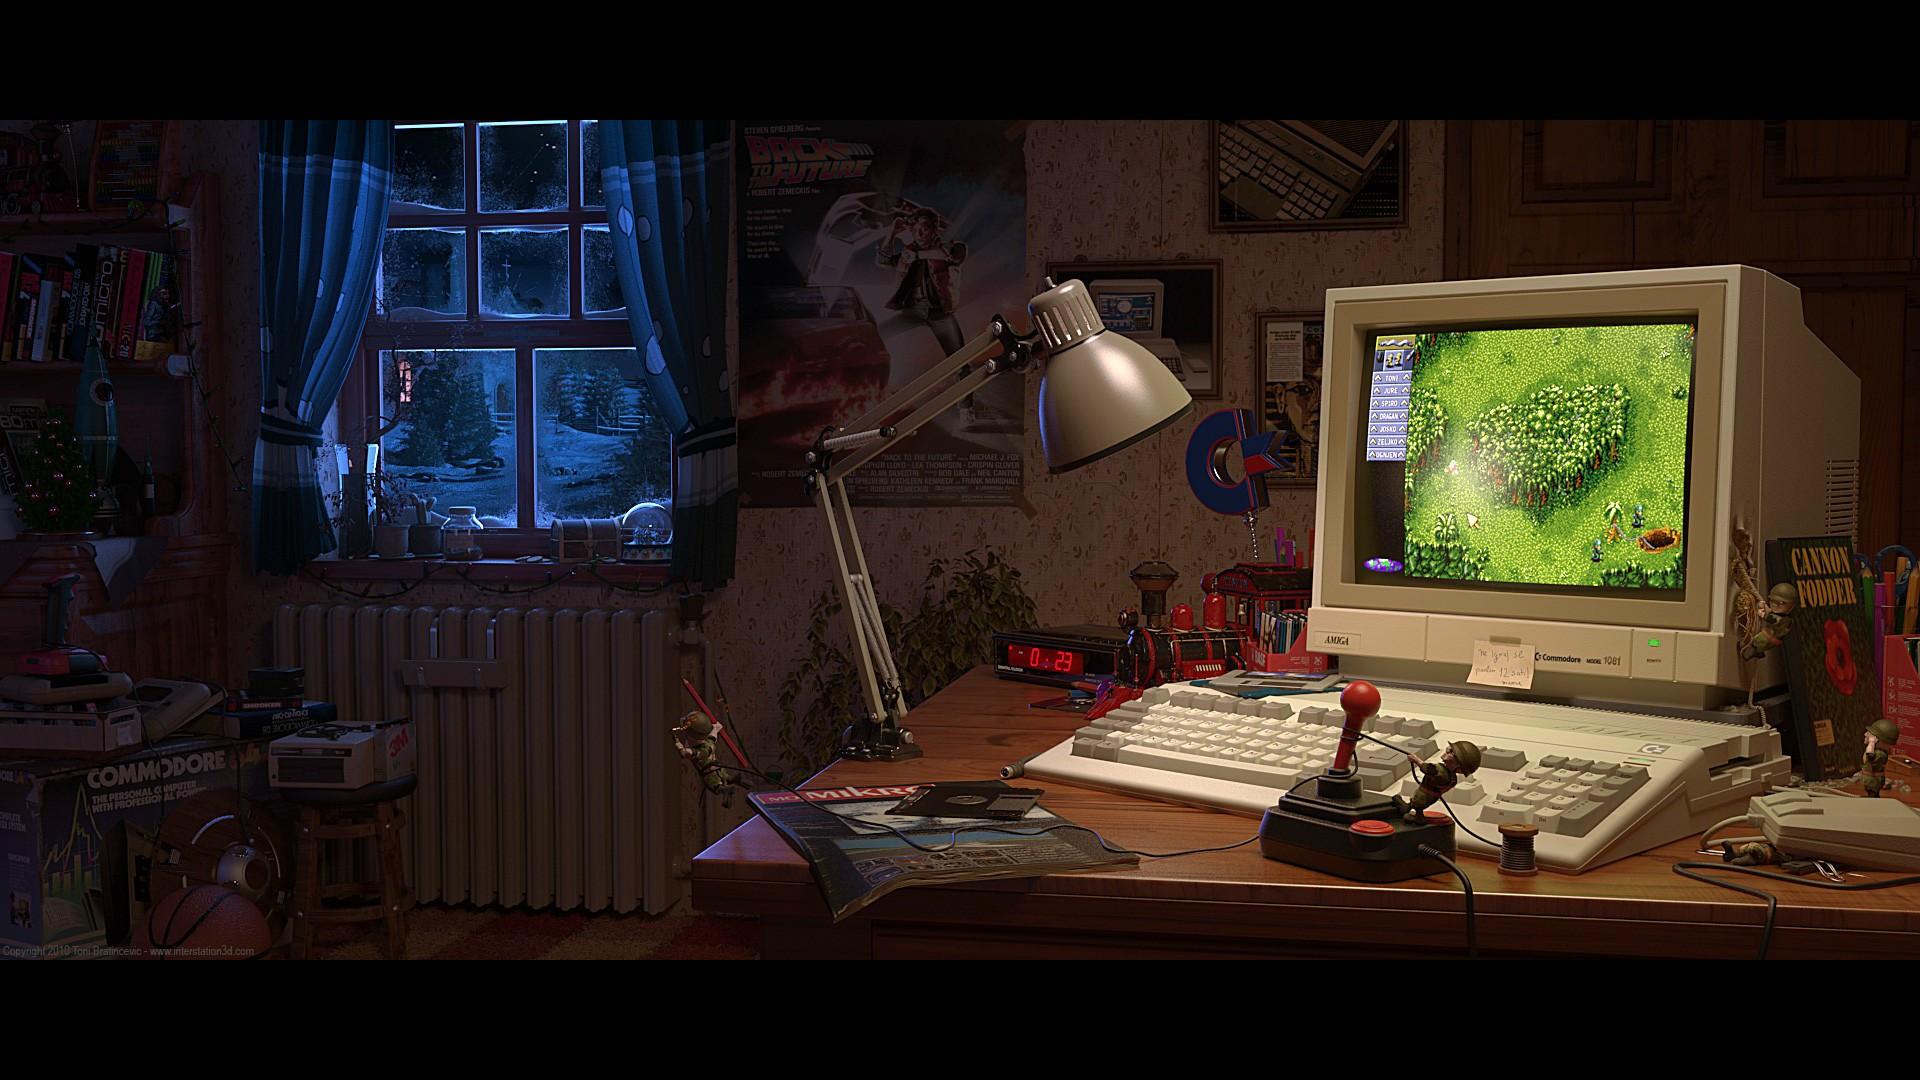 General 1920x1080 digital art Toni Bratincevic video games 3D nostalgia ArtStation Amiga computer joystick monitor room indoors technology vintage interior